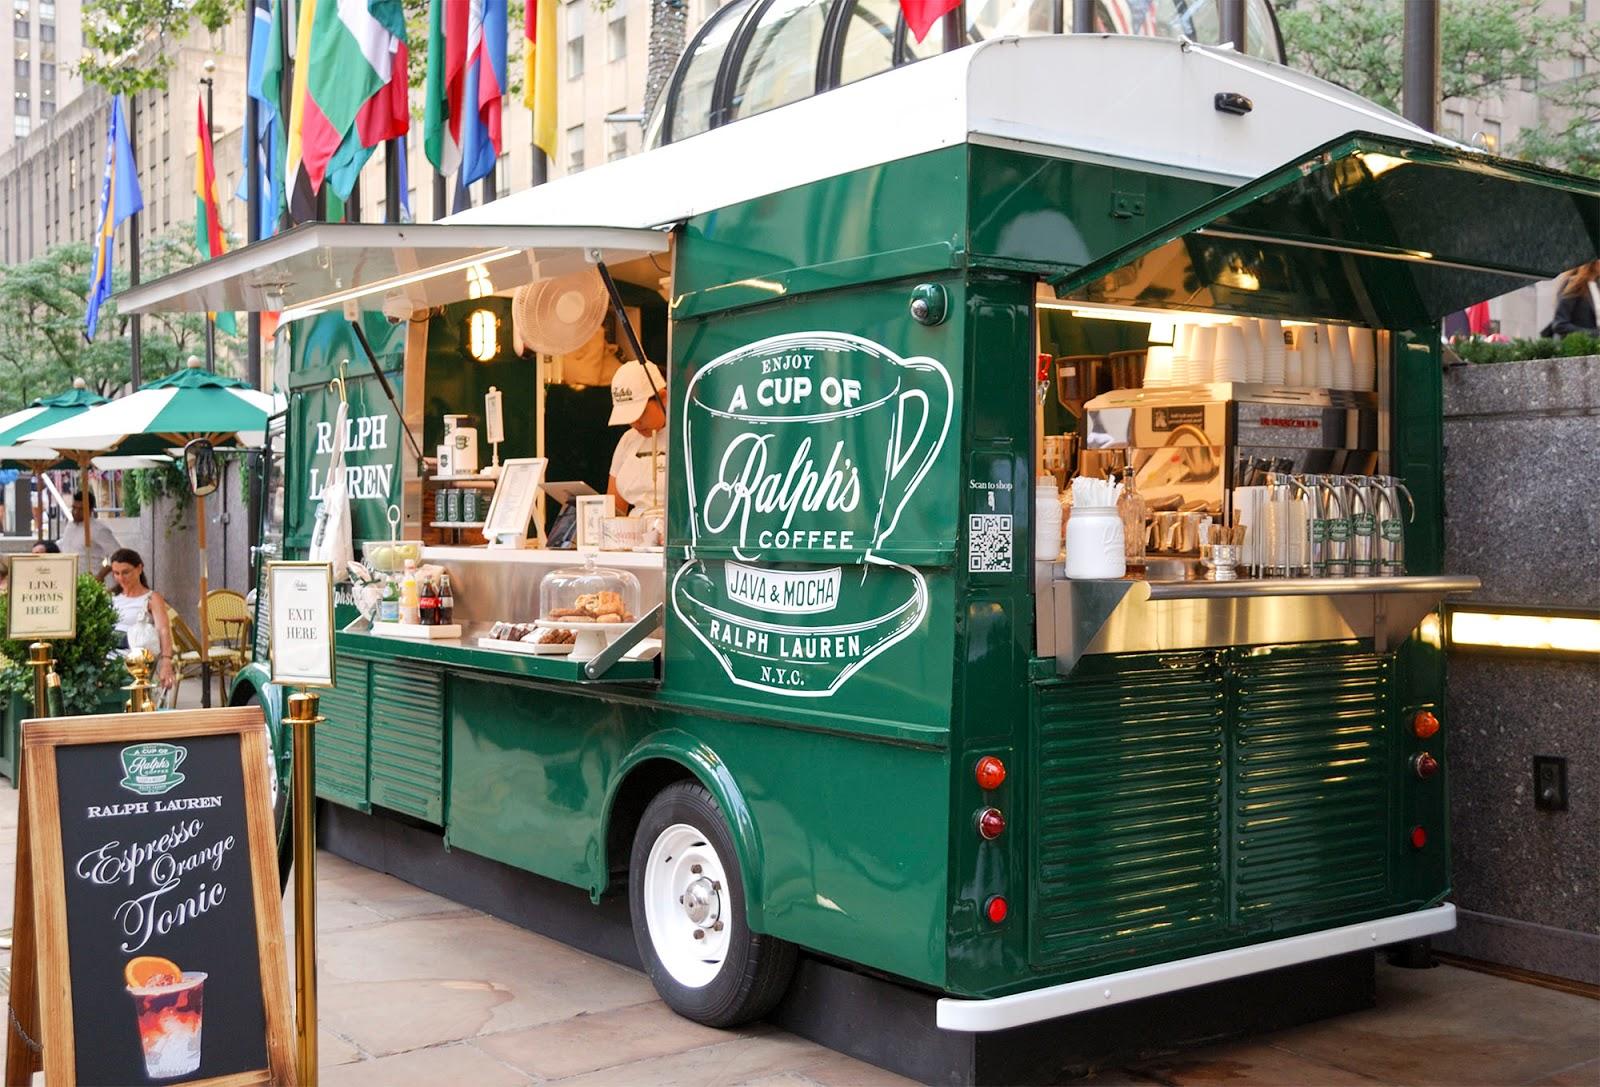 new york itinerary guide plan manhattan rockefeller shopping ralph's coffee food truck